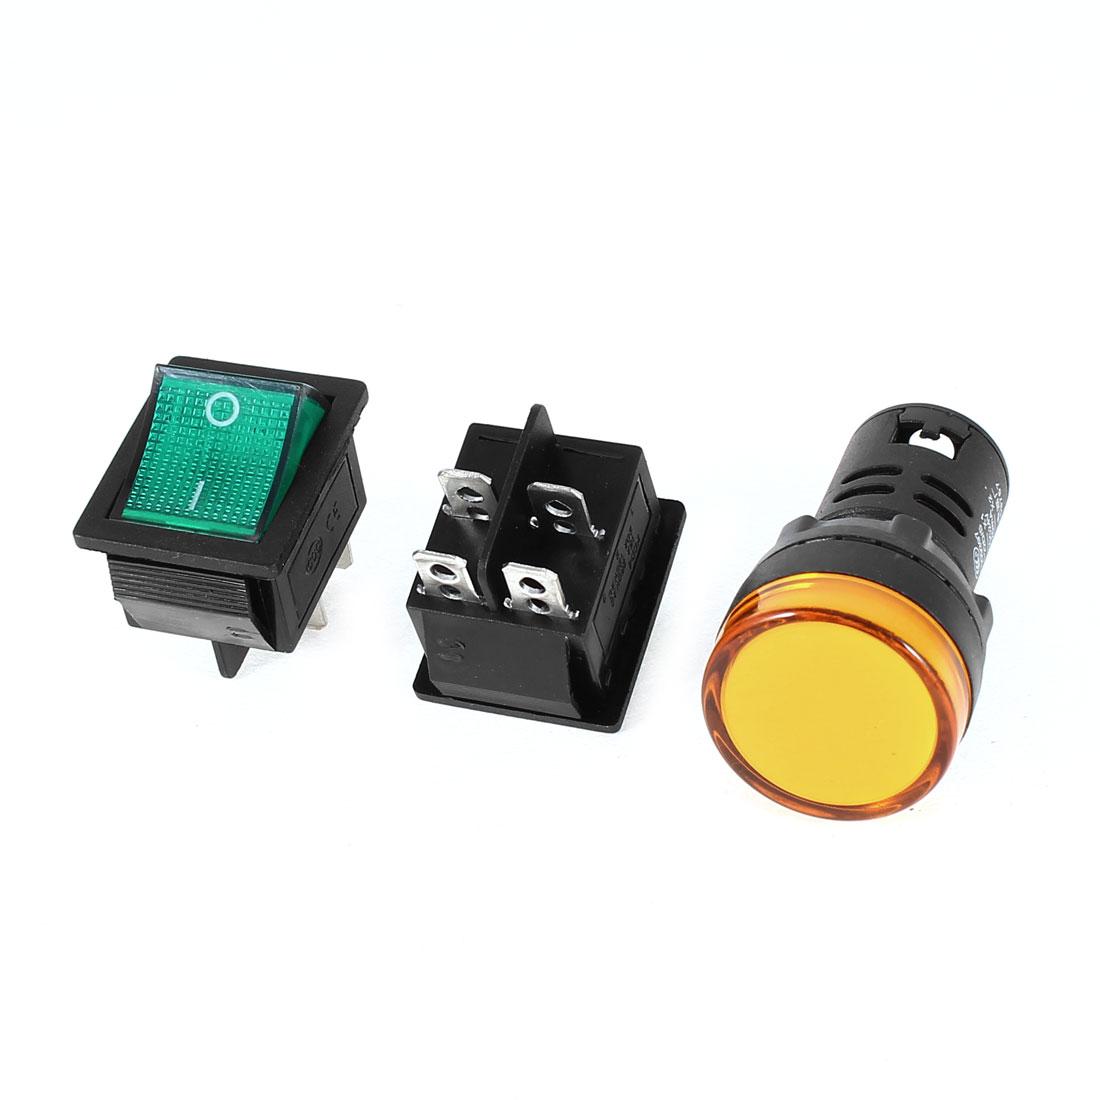 2x KCD4 DPST Green Light Rocker Switch + 1x AD16-22D/S Yellow Pilot LED Lamp DC 24V